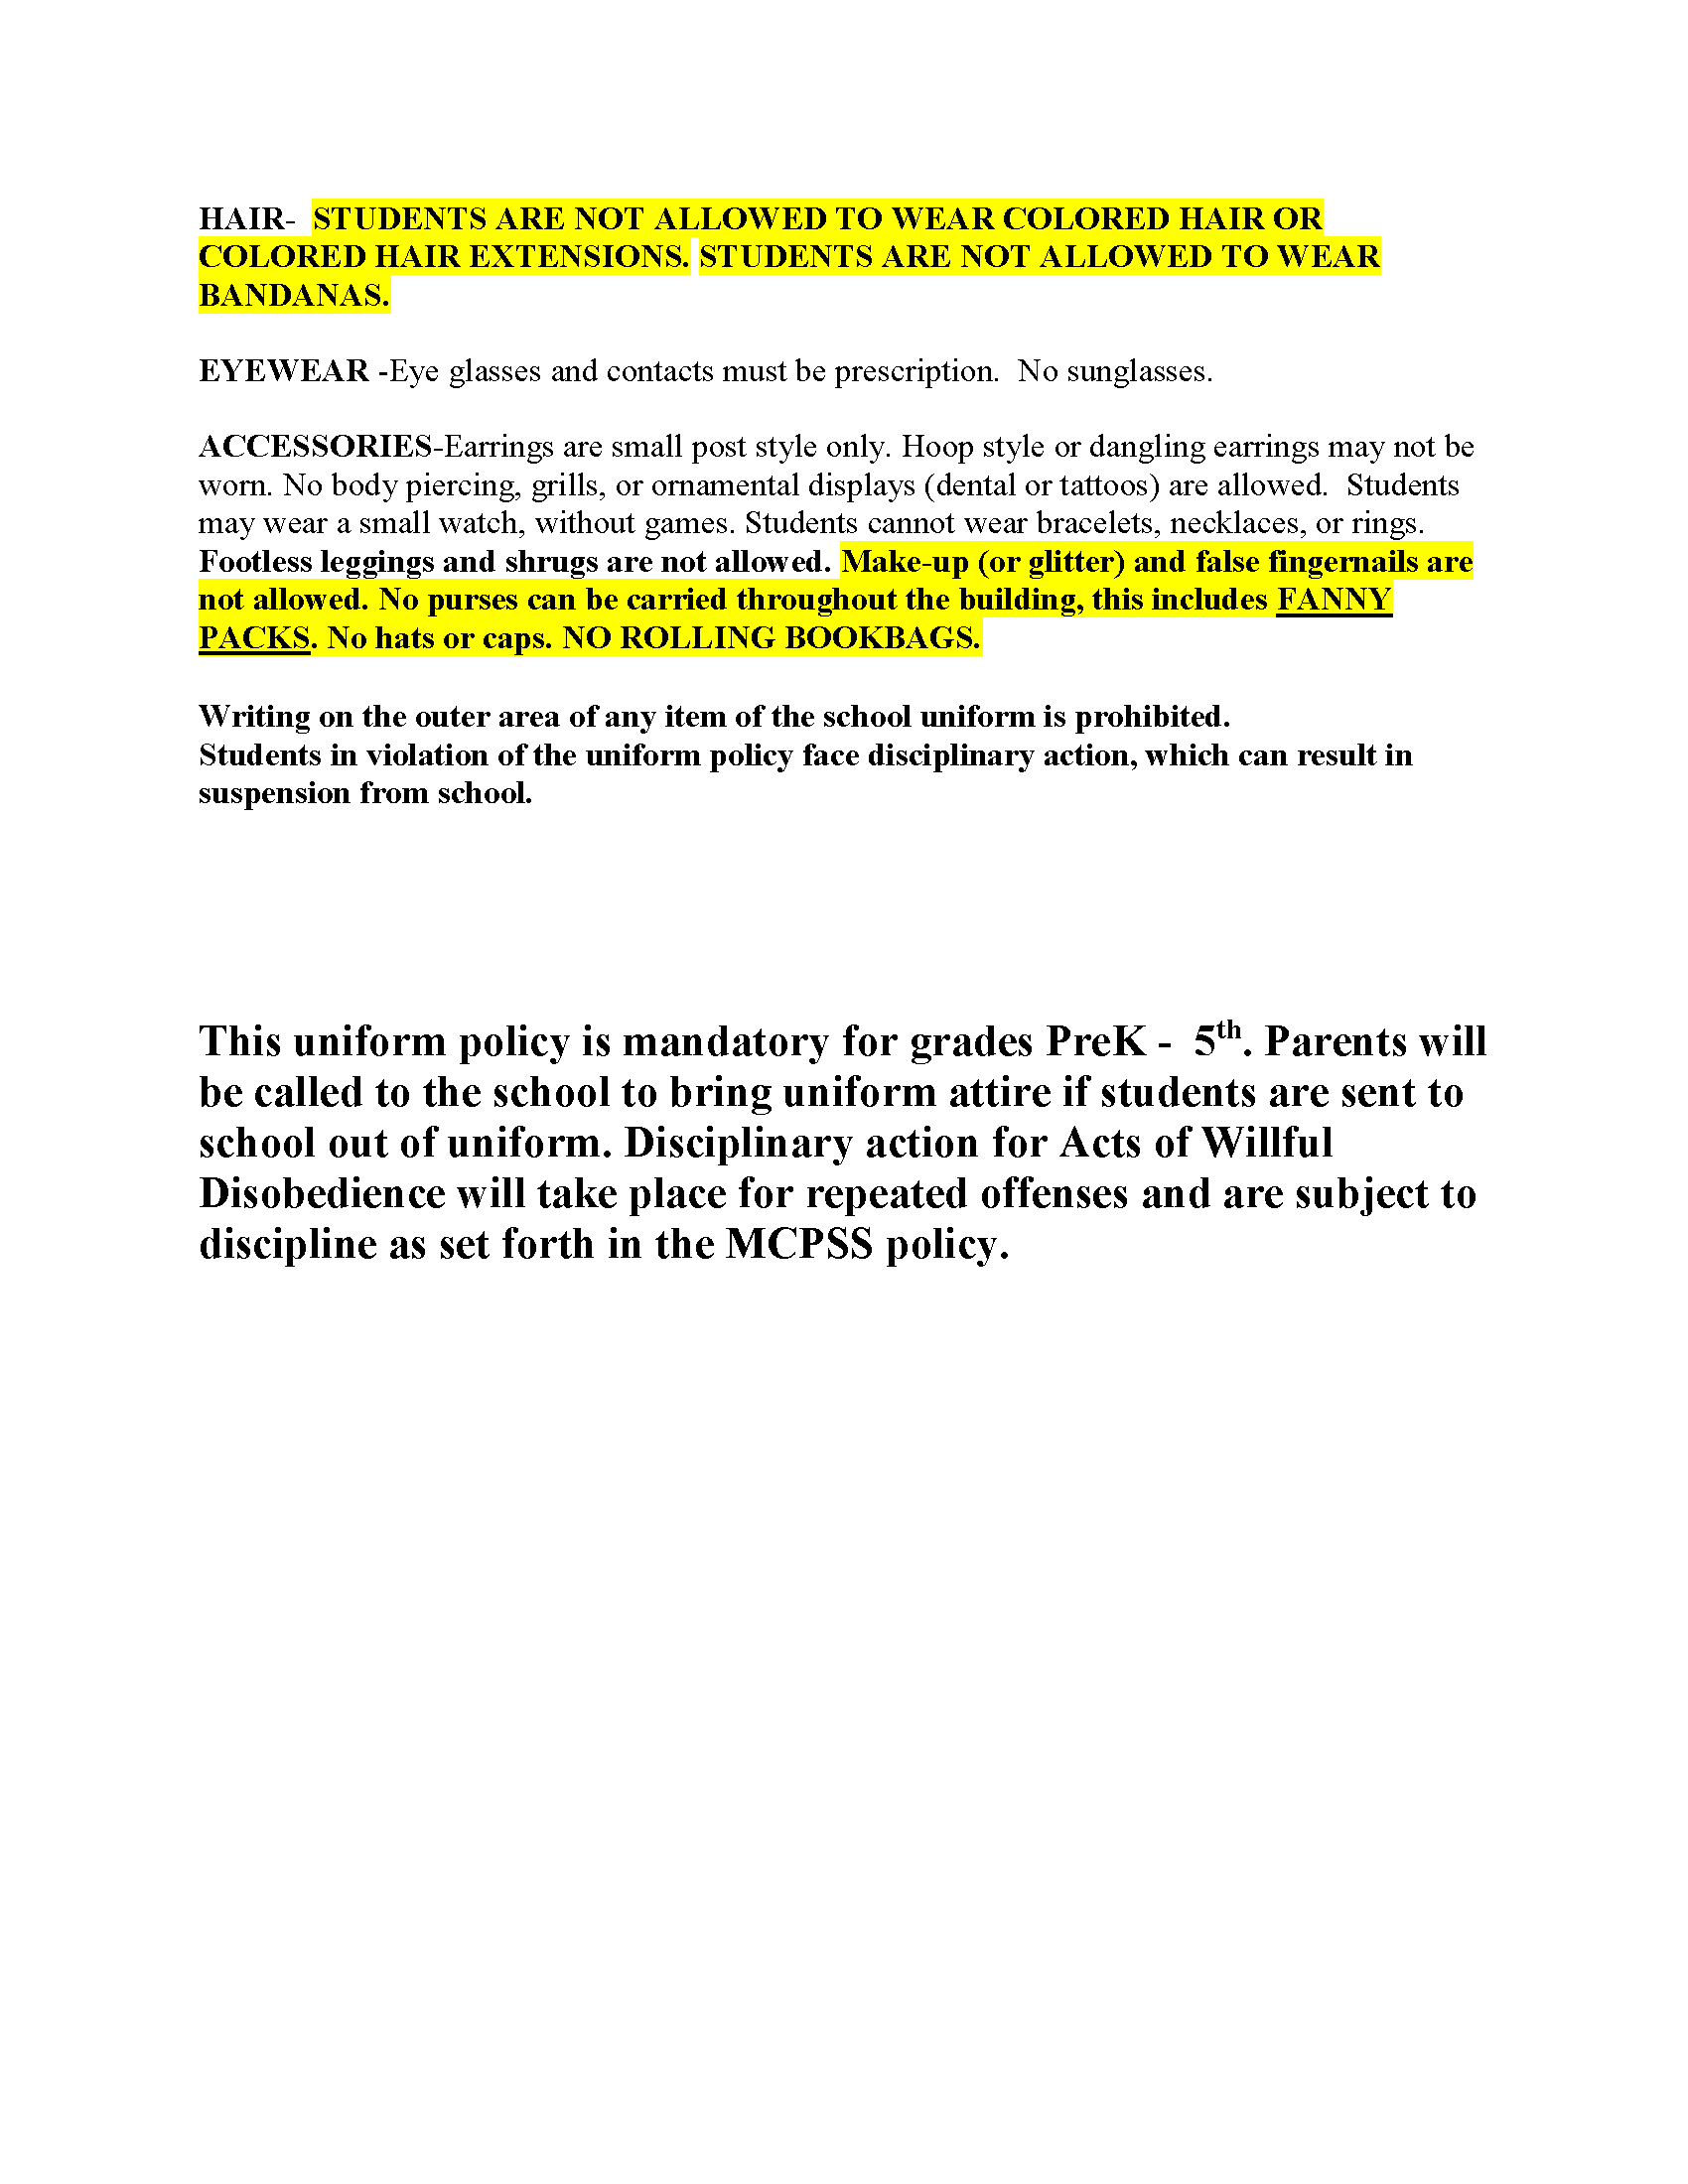 2020-2021 Uniform Policy 2